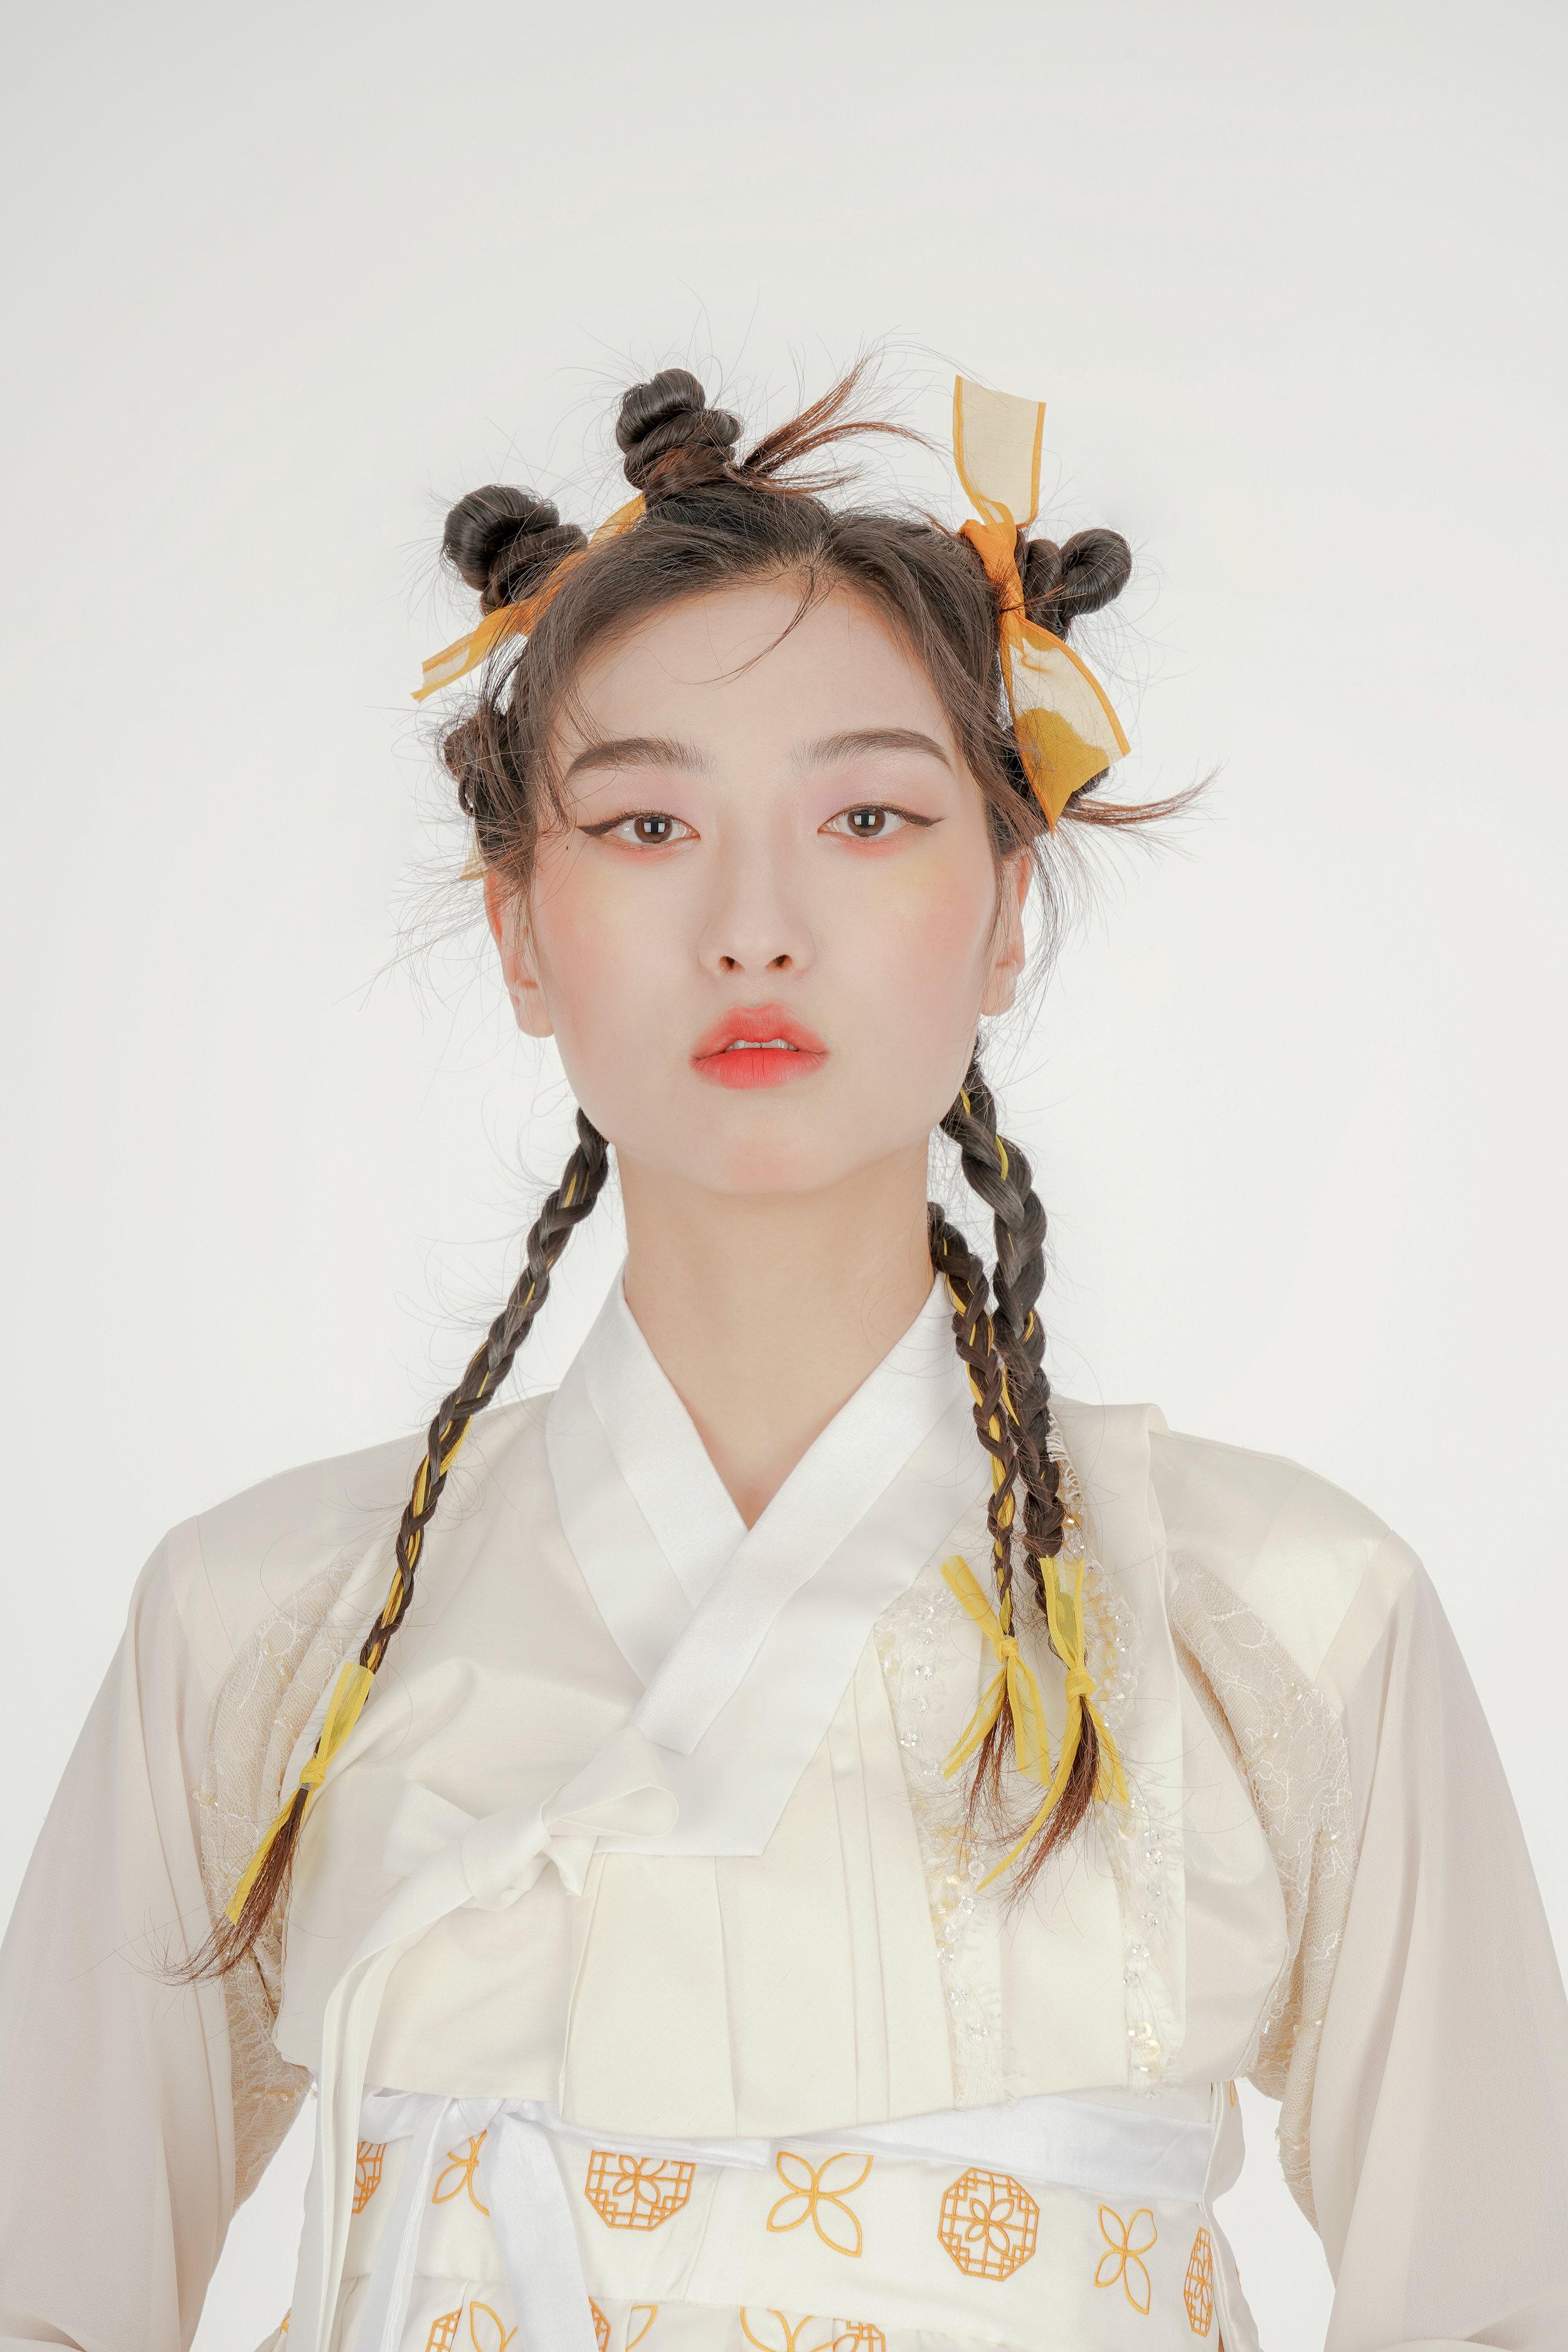 Danha - Korea based designer